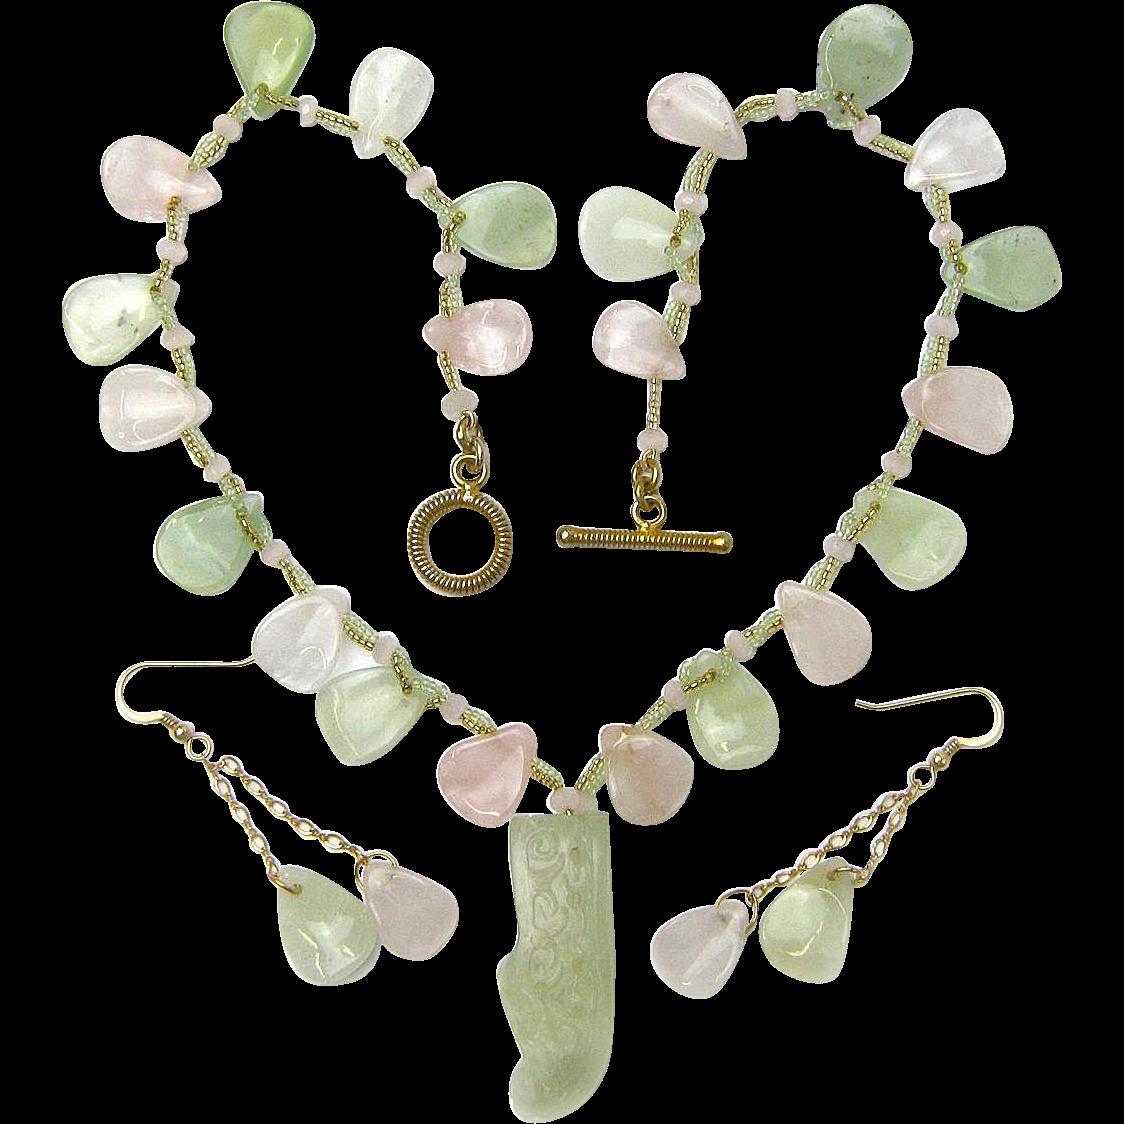 Rose Quartz & New Jade Necklace  w/ Carved Shoe Pendant